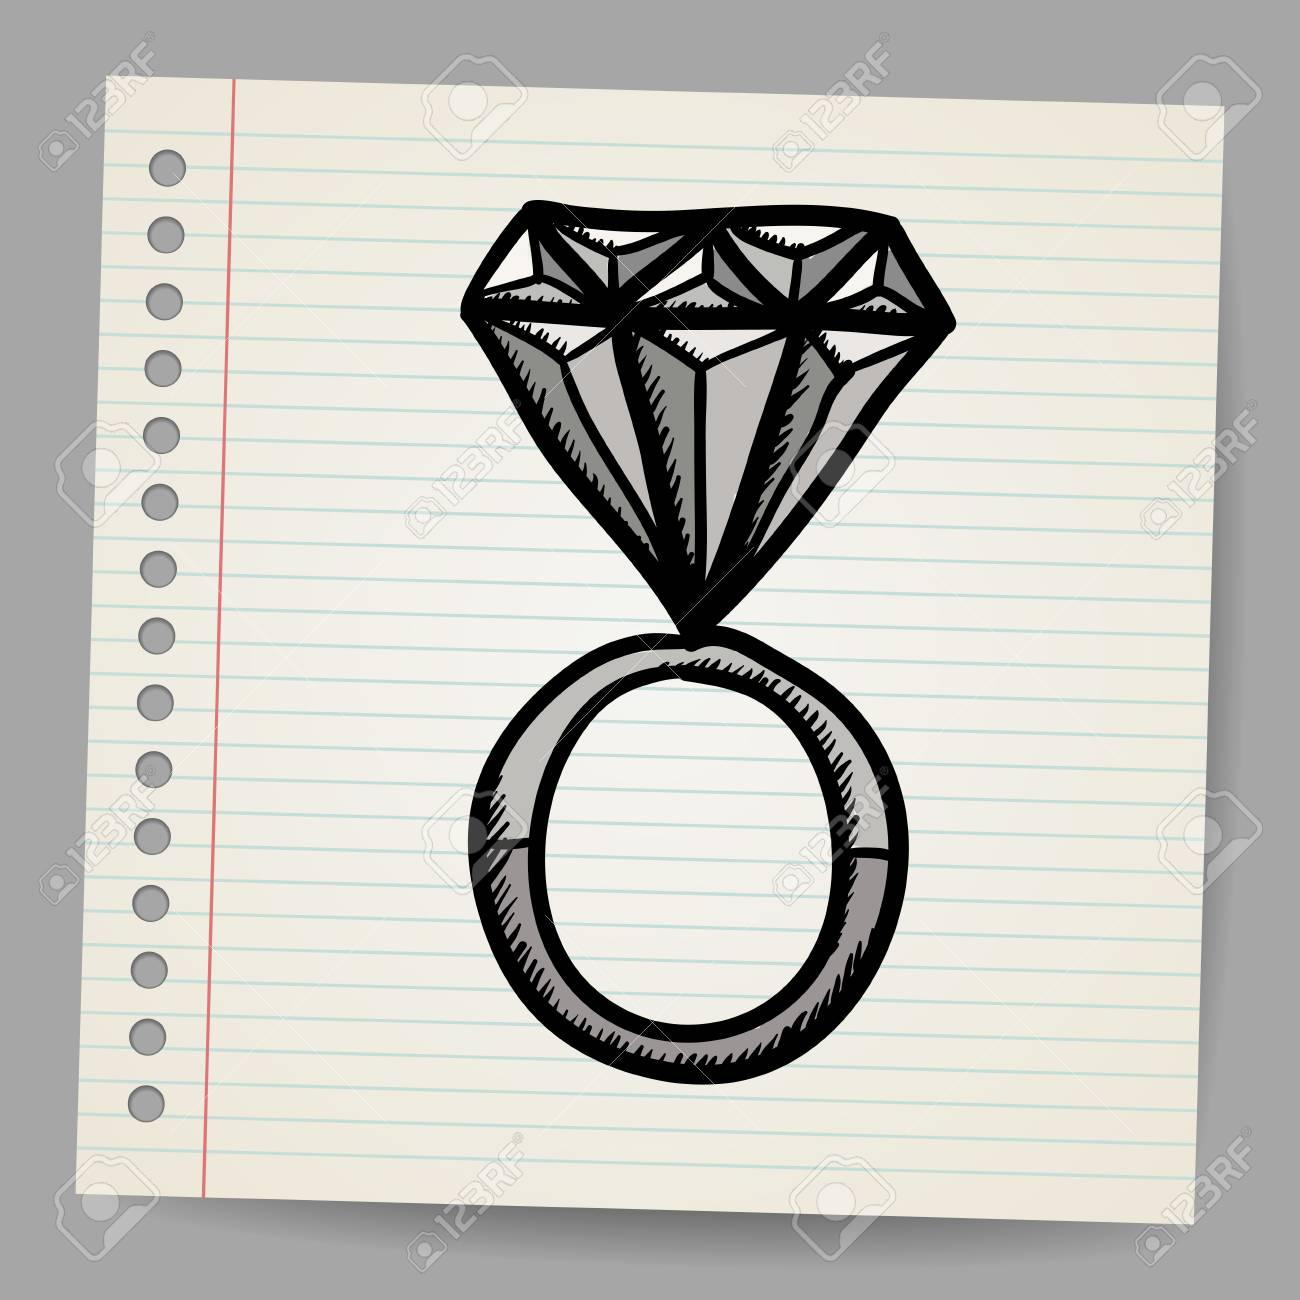 Doodle style diamond illustration Stock Vector - 18791138